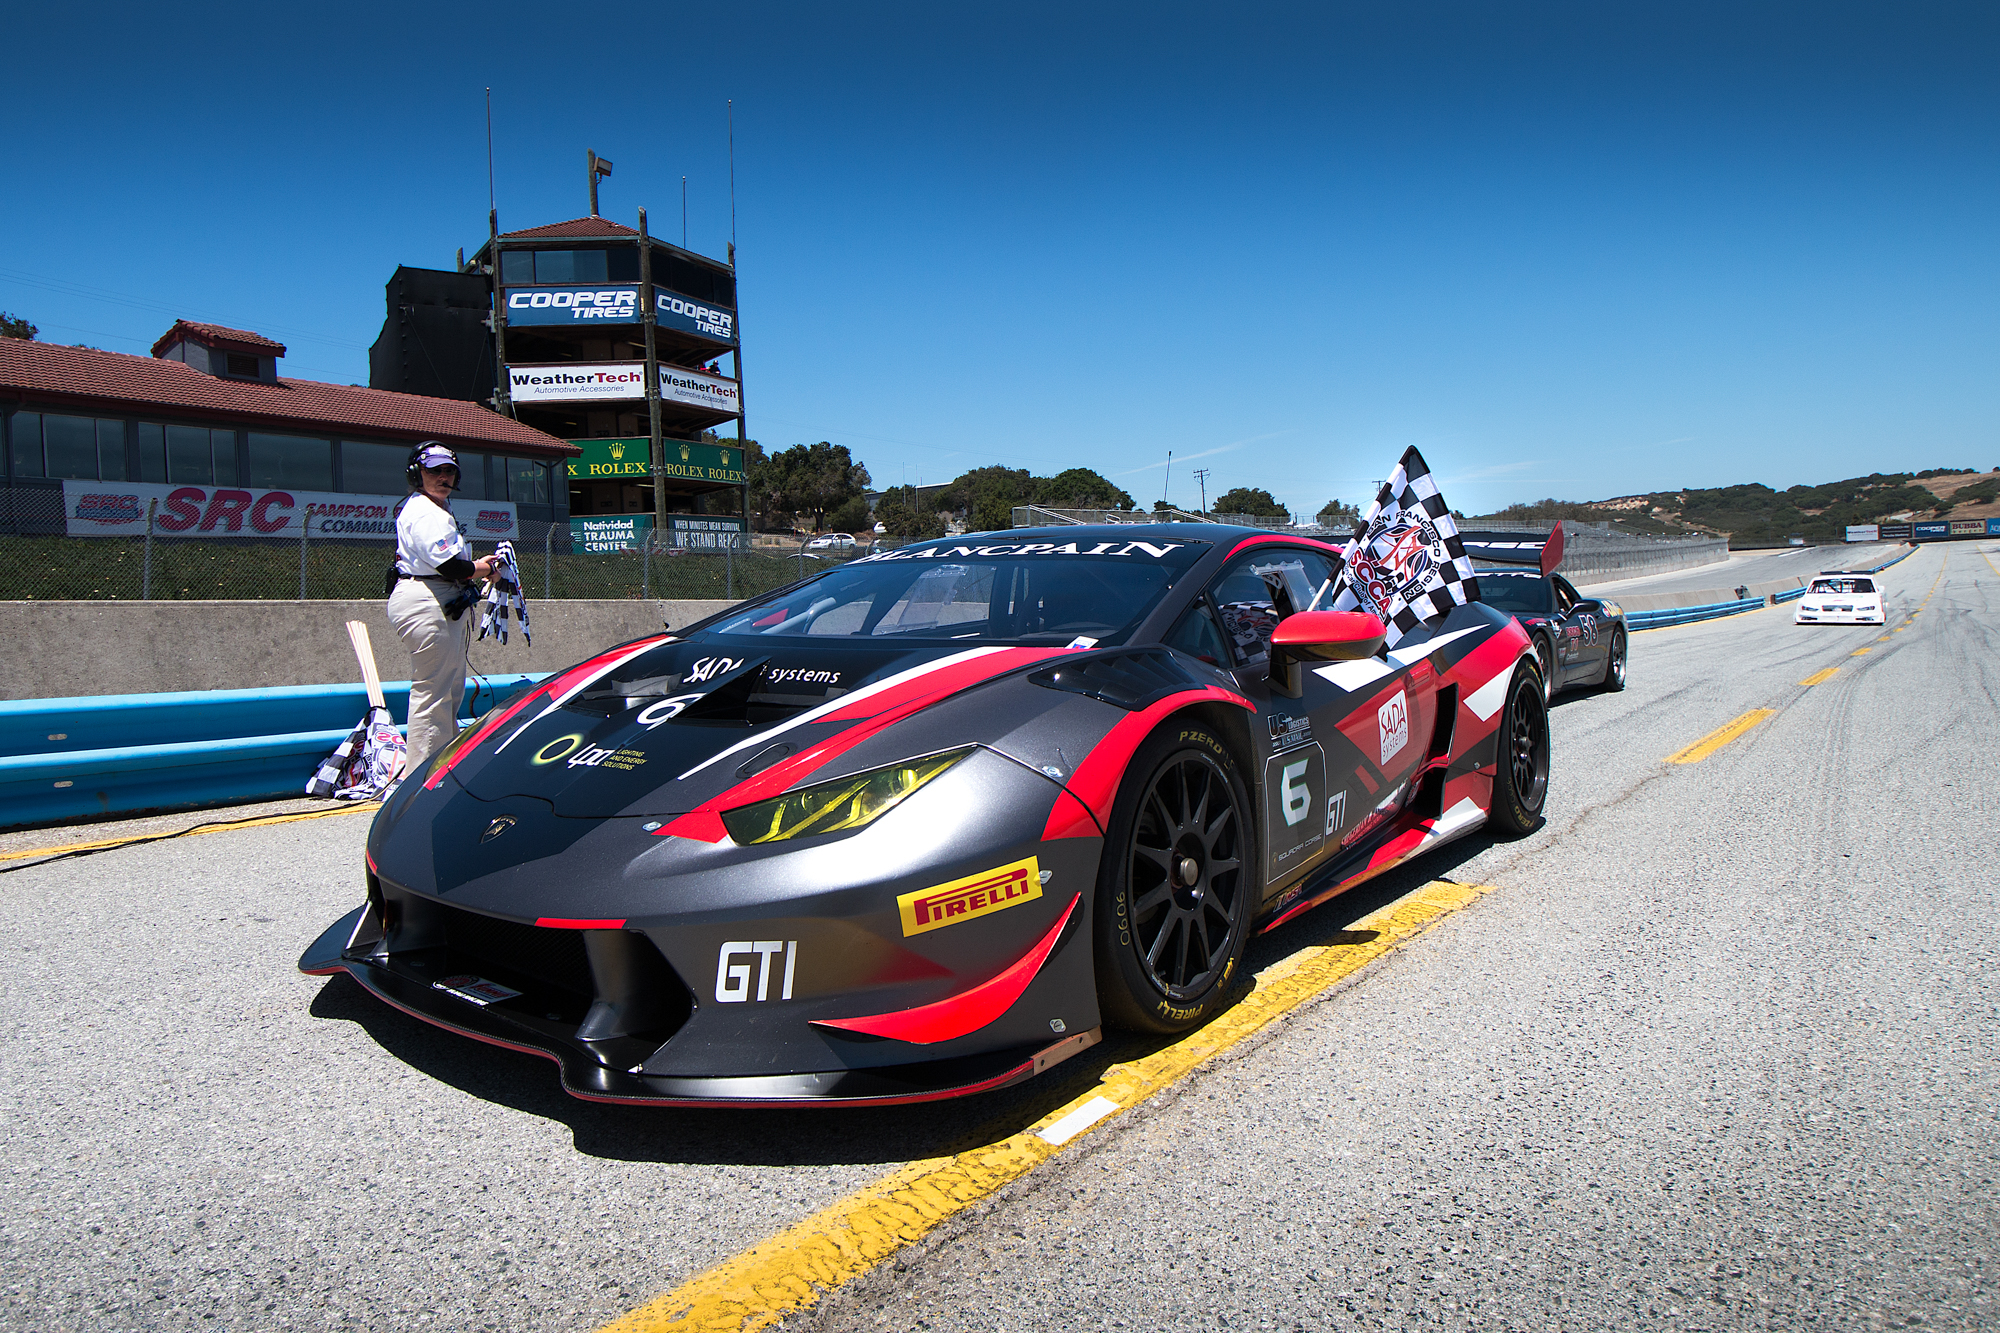 Steven-Racing-Laguna-20131004-97782.jpg